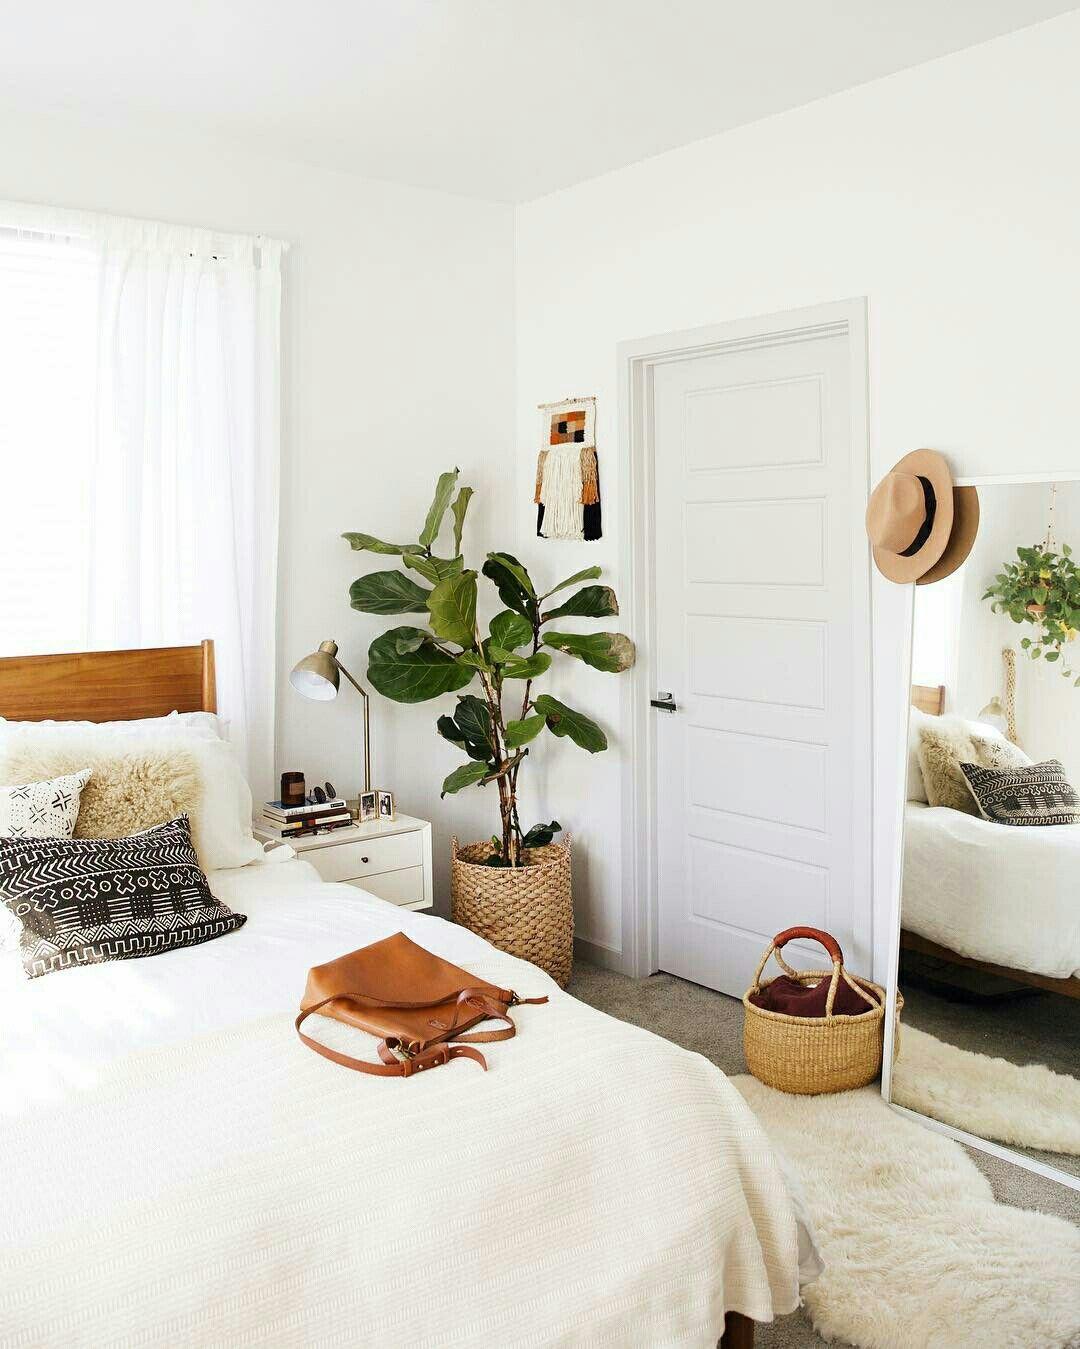 Master Bedroom Minimalist Design Enchanting Pinterest  Karengm29 🌸  B E D R O O M  Pinterest  Bedrooms Design Ideas